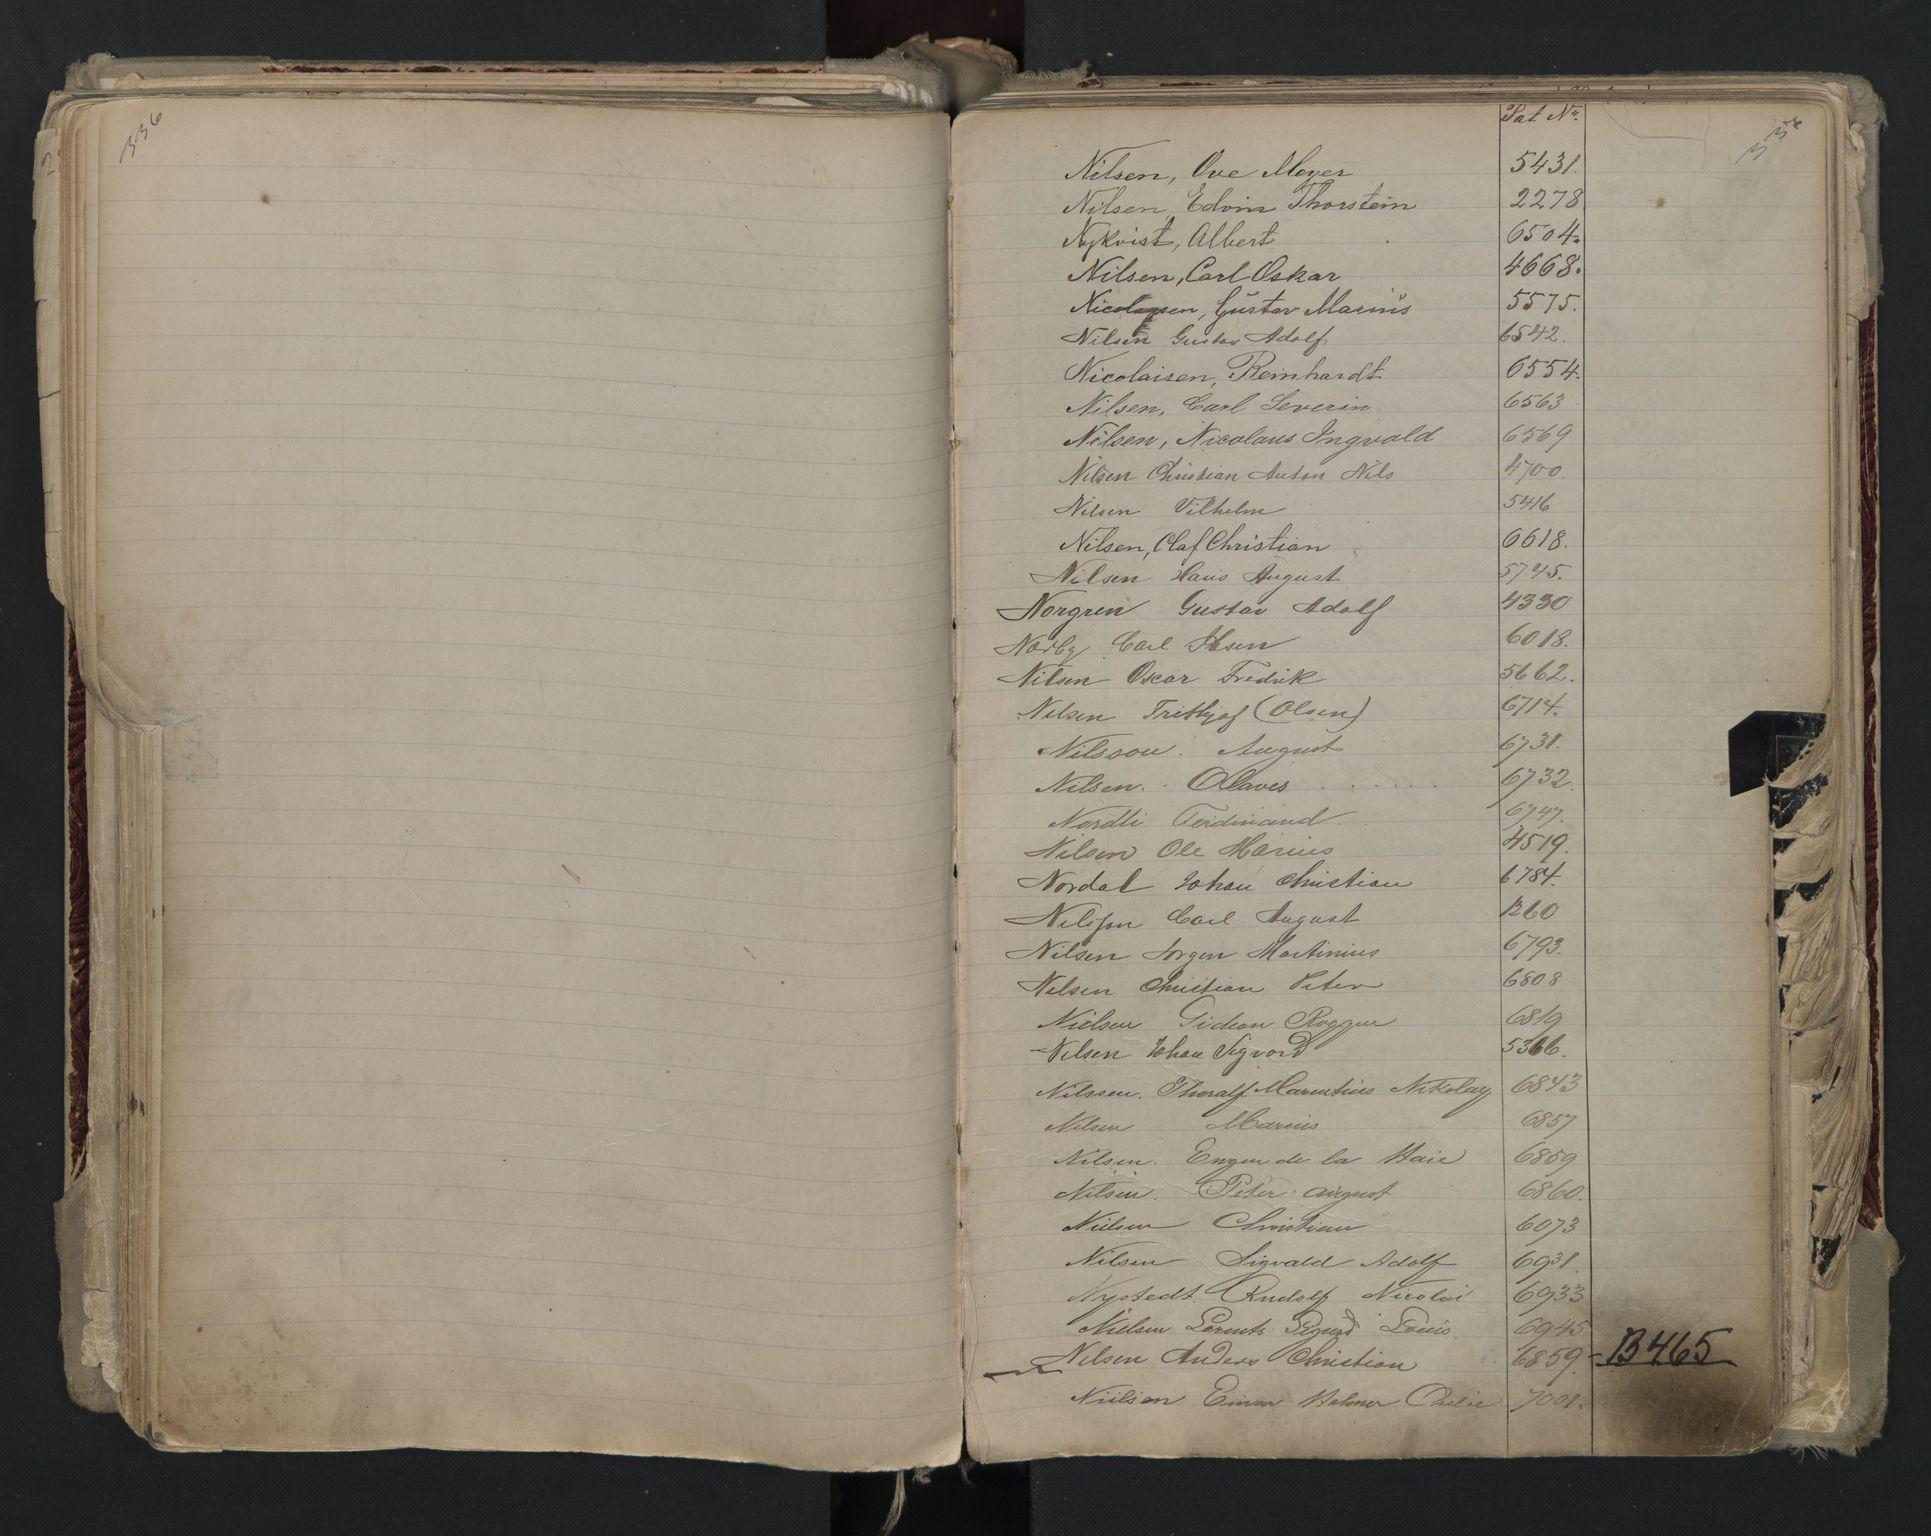 SAO, Oslo sjømannskontor, F/Fa/L0002: Register for Kristiania krets, 1866-1930, s. 336-337